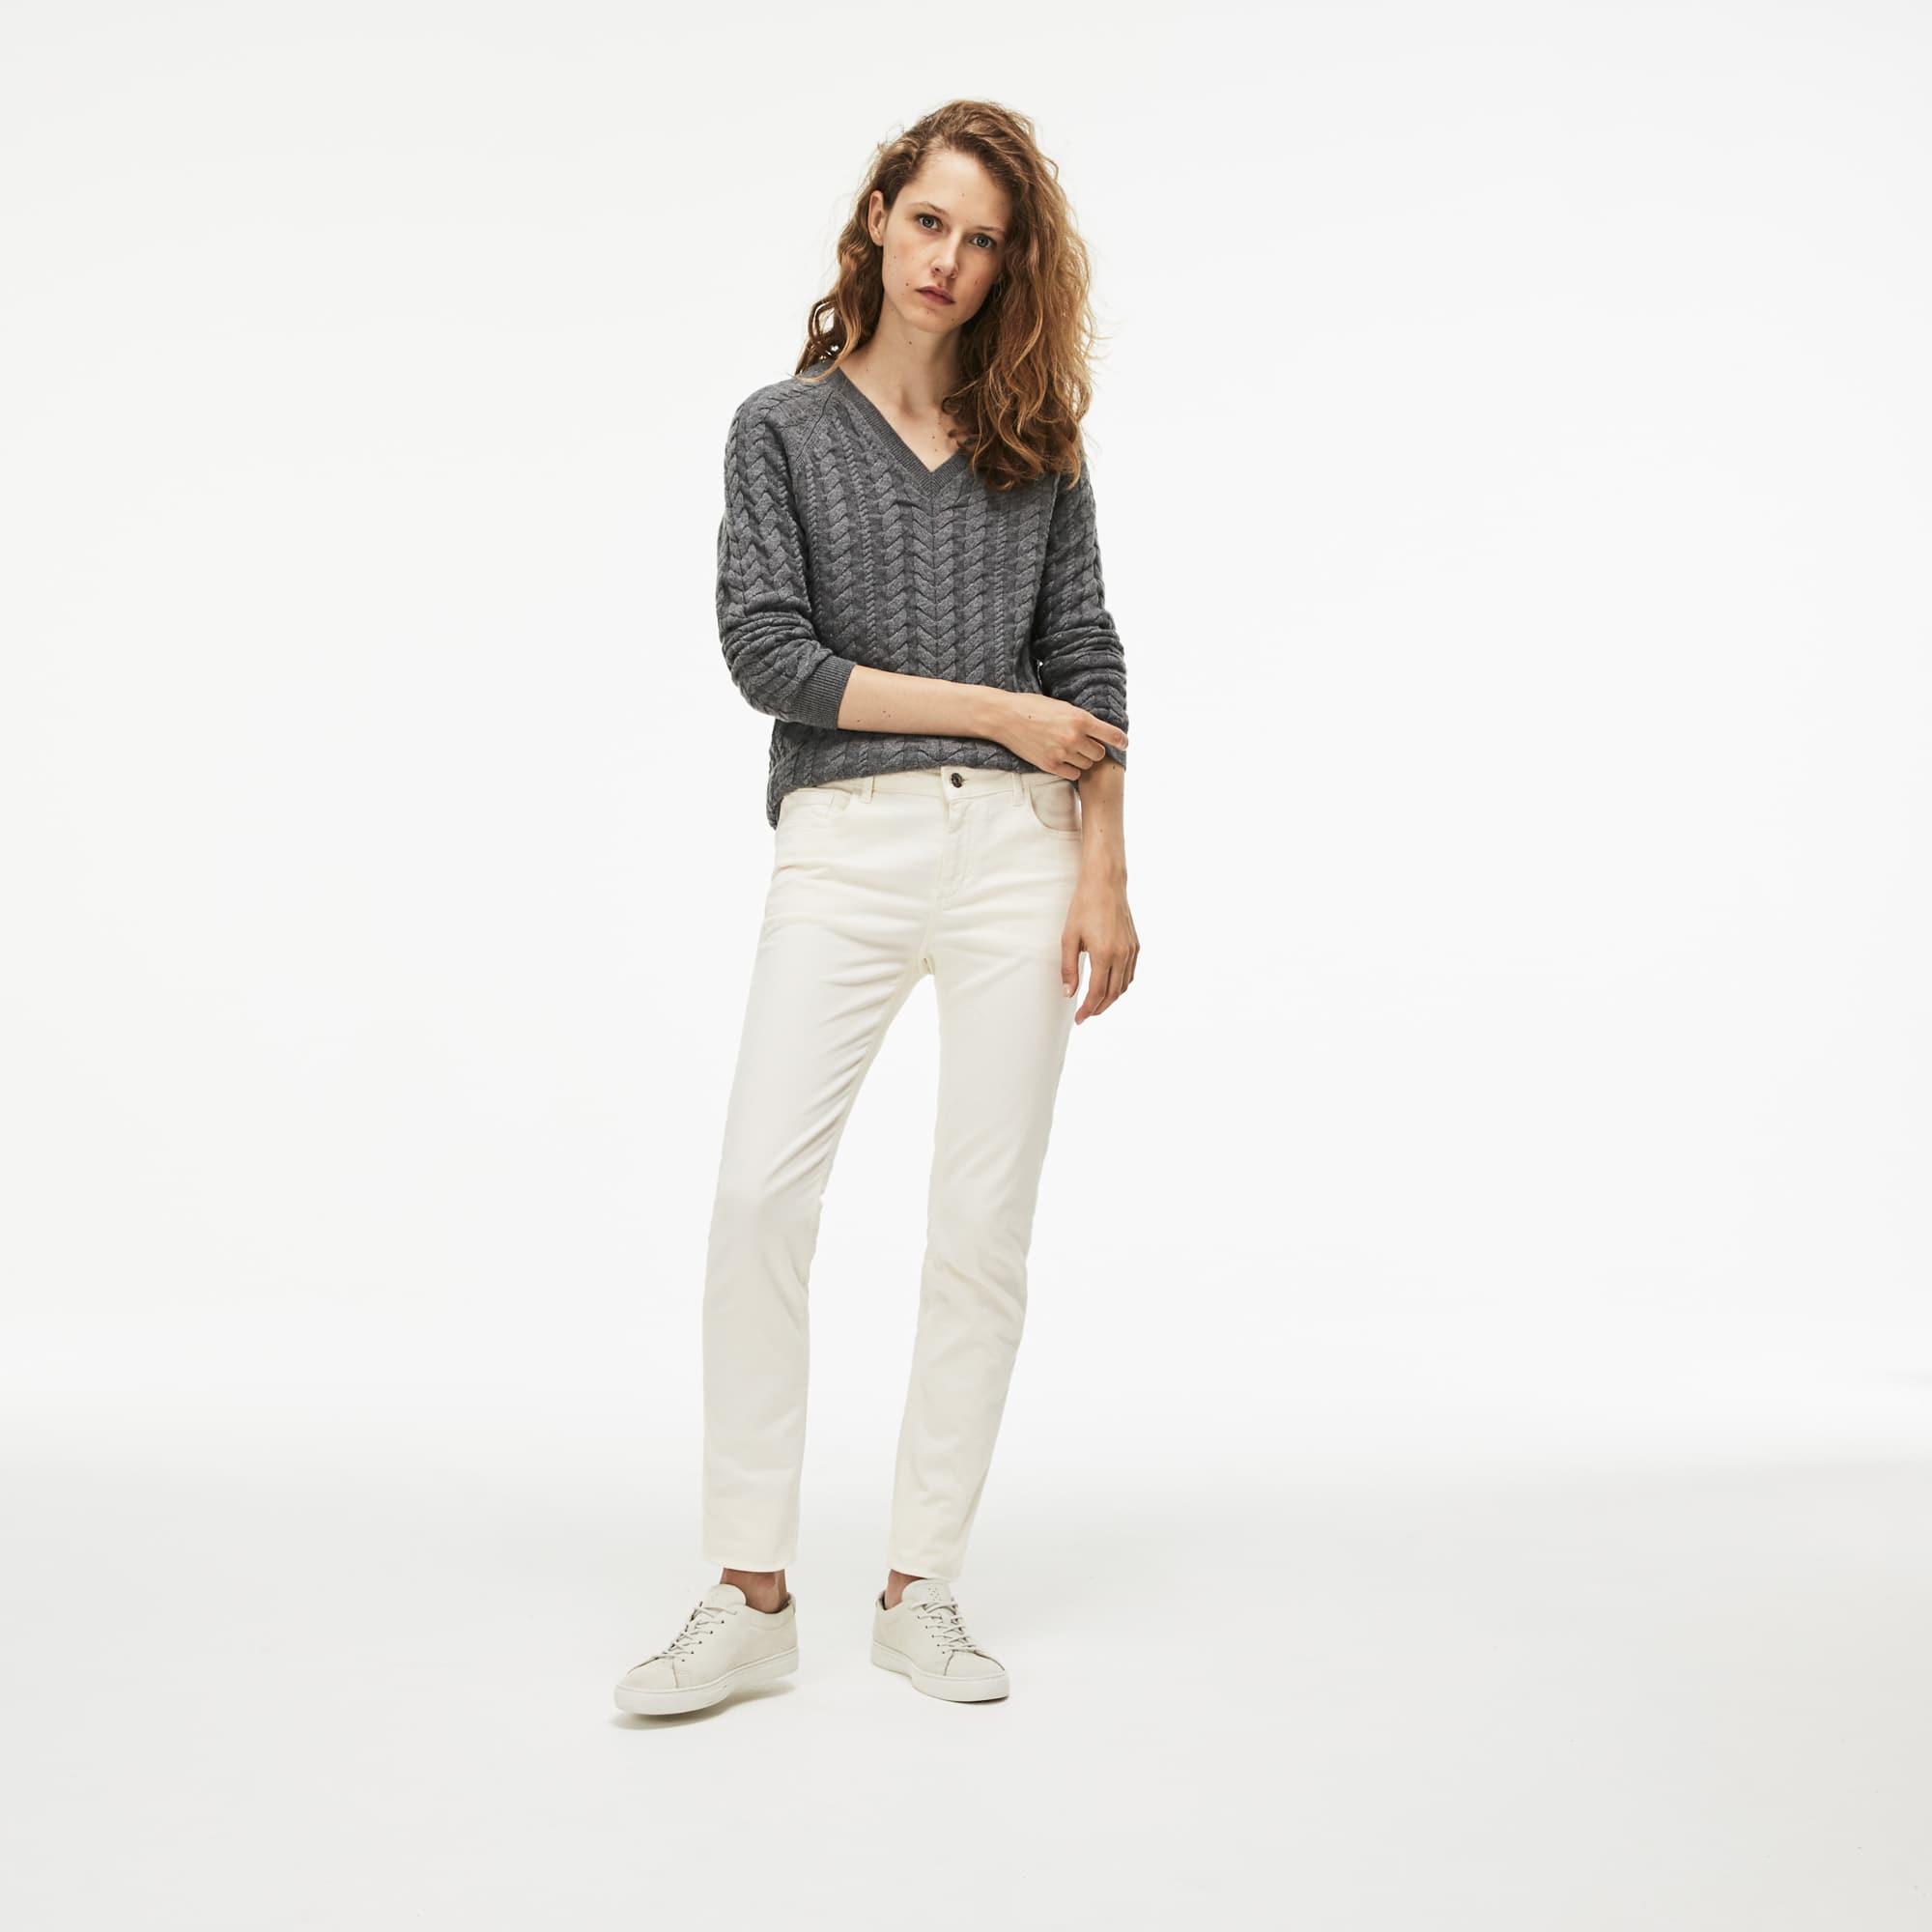 53f687e2 Women's Slim Fit Stretch Cotton Denim Jeans